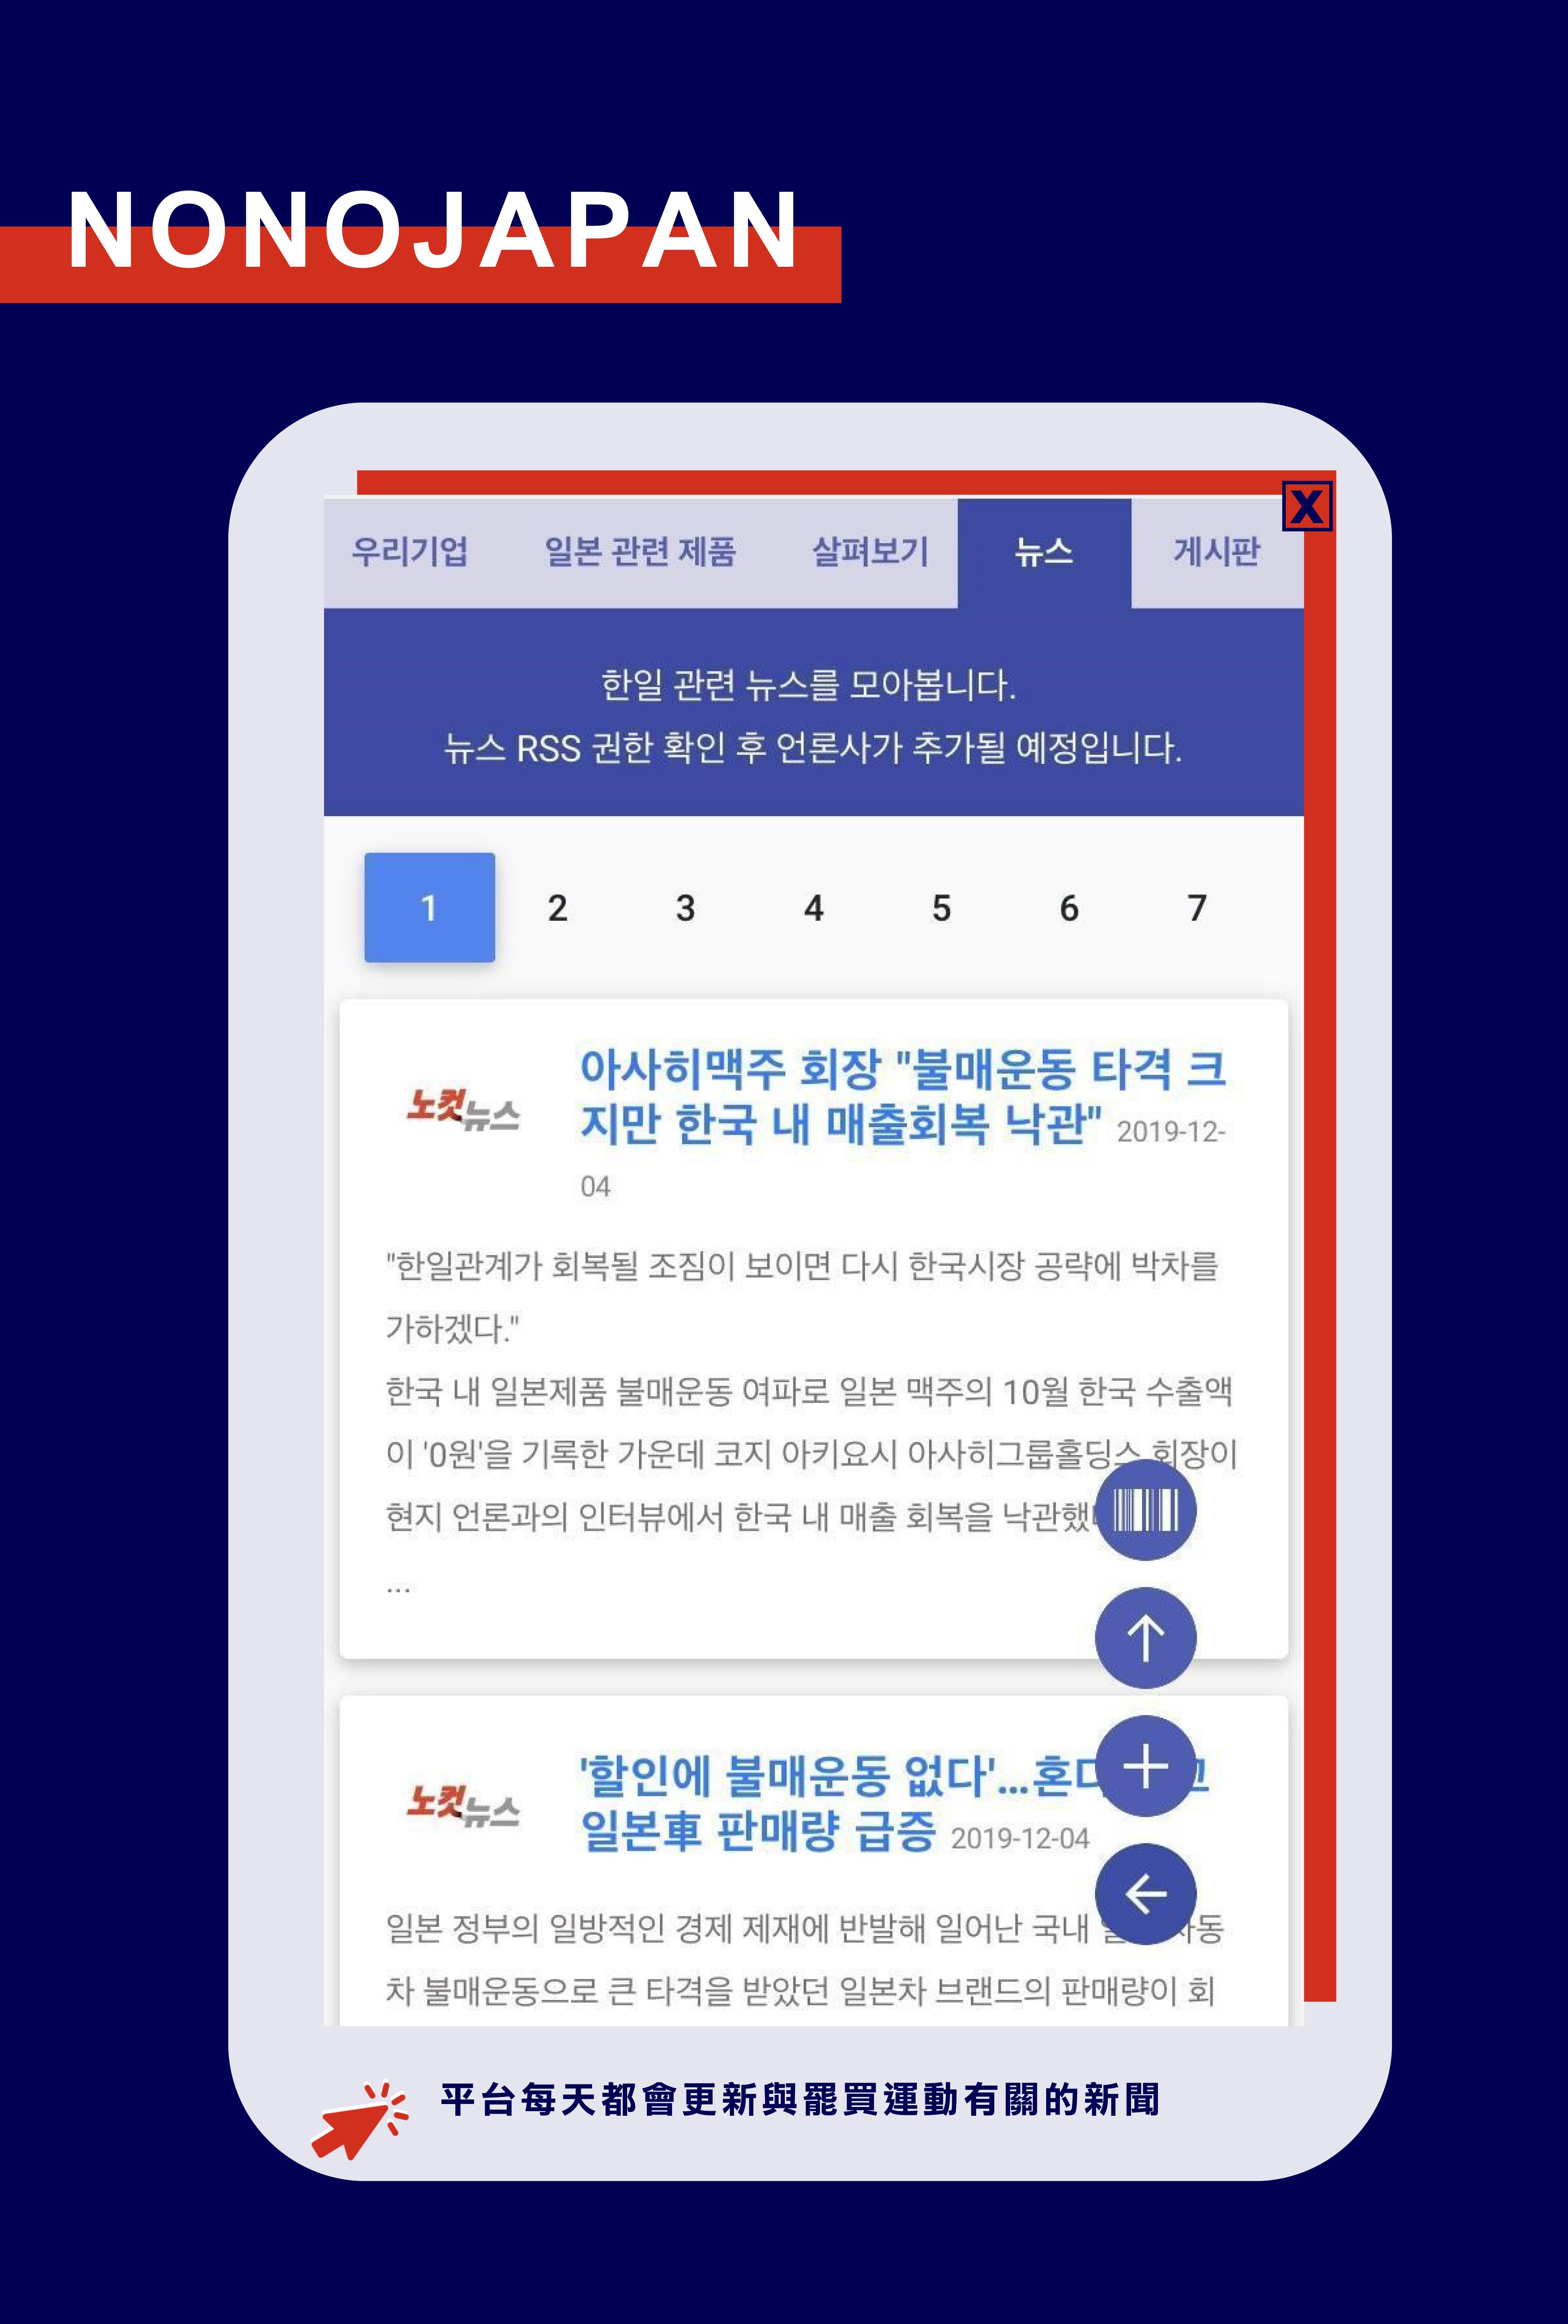 http://ubeat.com.cuhk.edu.hk/wp-content/uploads/2018/box4.jpg